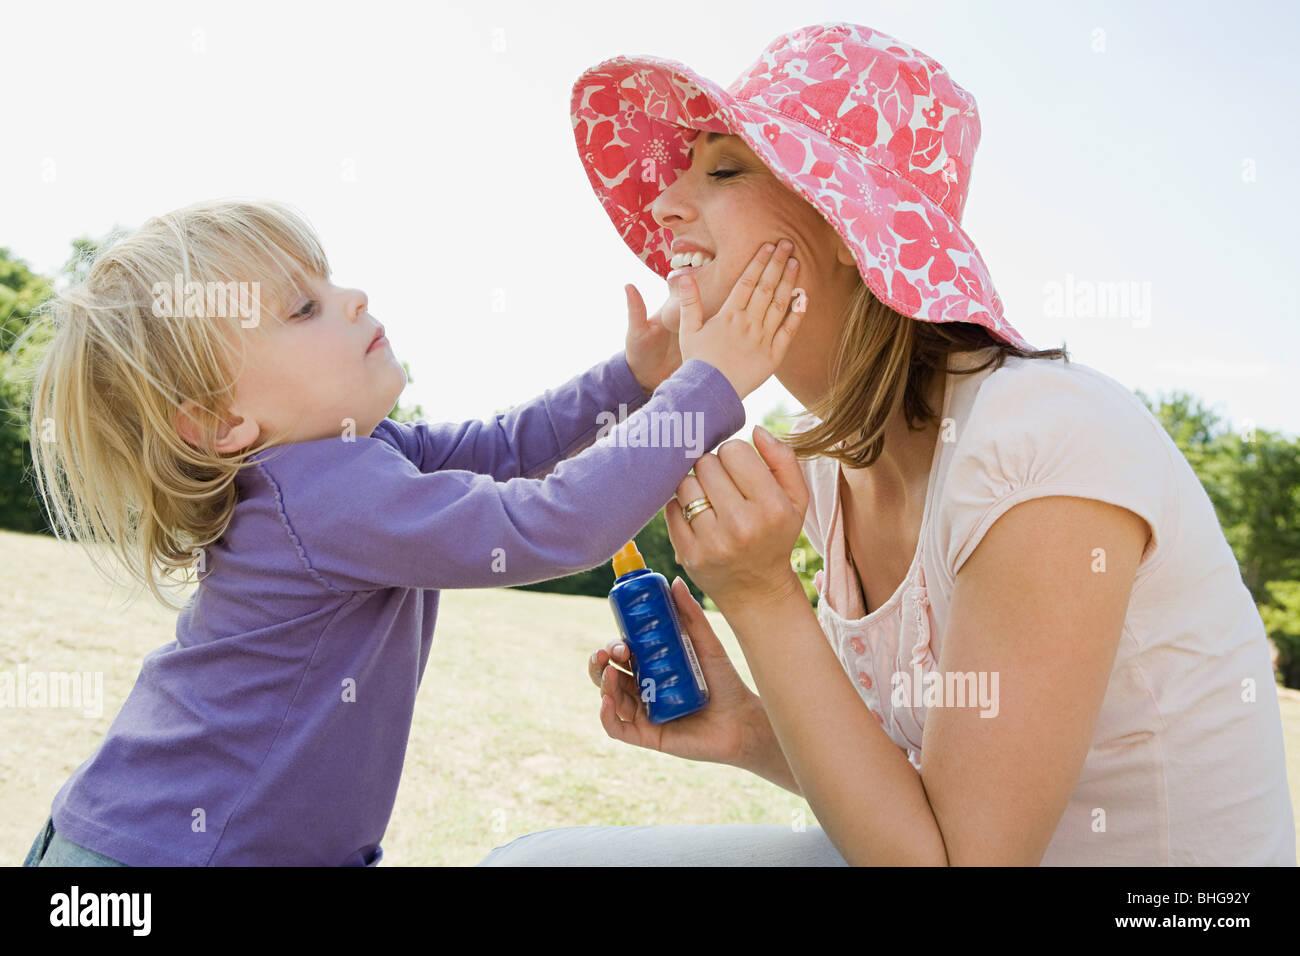 Girl putting suncream on mother - Stock Image